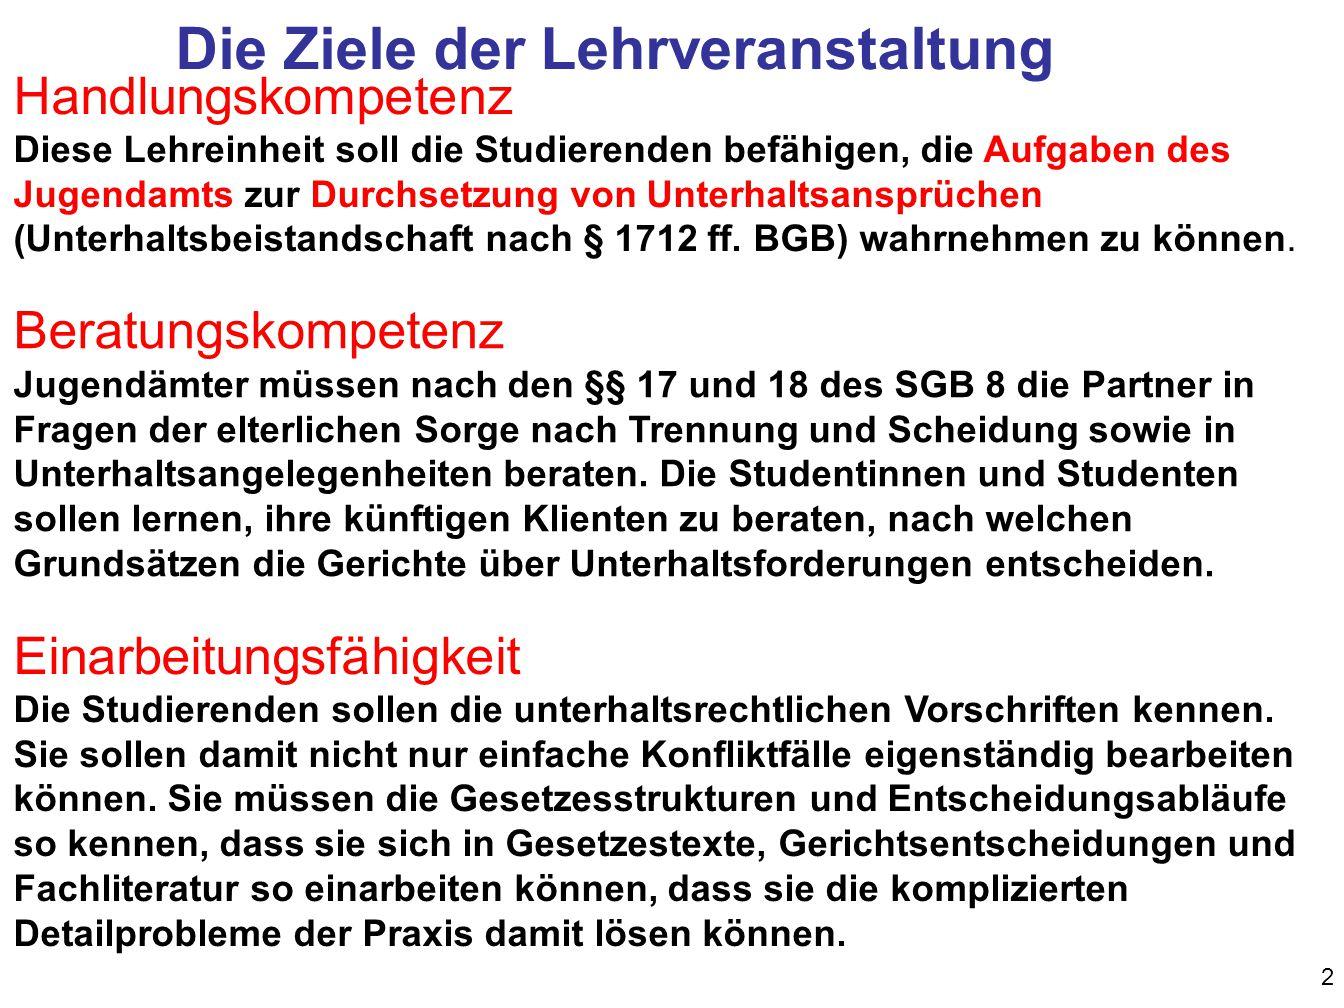 3 Wirt- schafts- recht BGB Arbeits- recht Öffentliches Recht Verwal- tungs- recht Ver- fassungs- recht Sozial- recht Deutsches Recht Standort des Familienrechts im Rechtssystem Privatrecht 1.